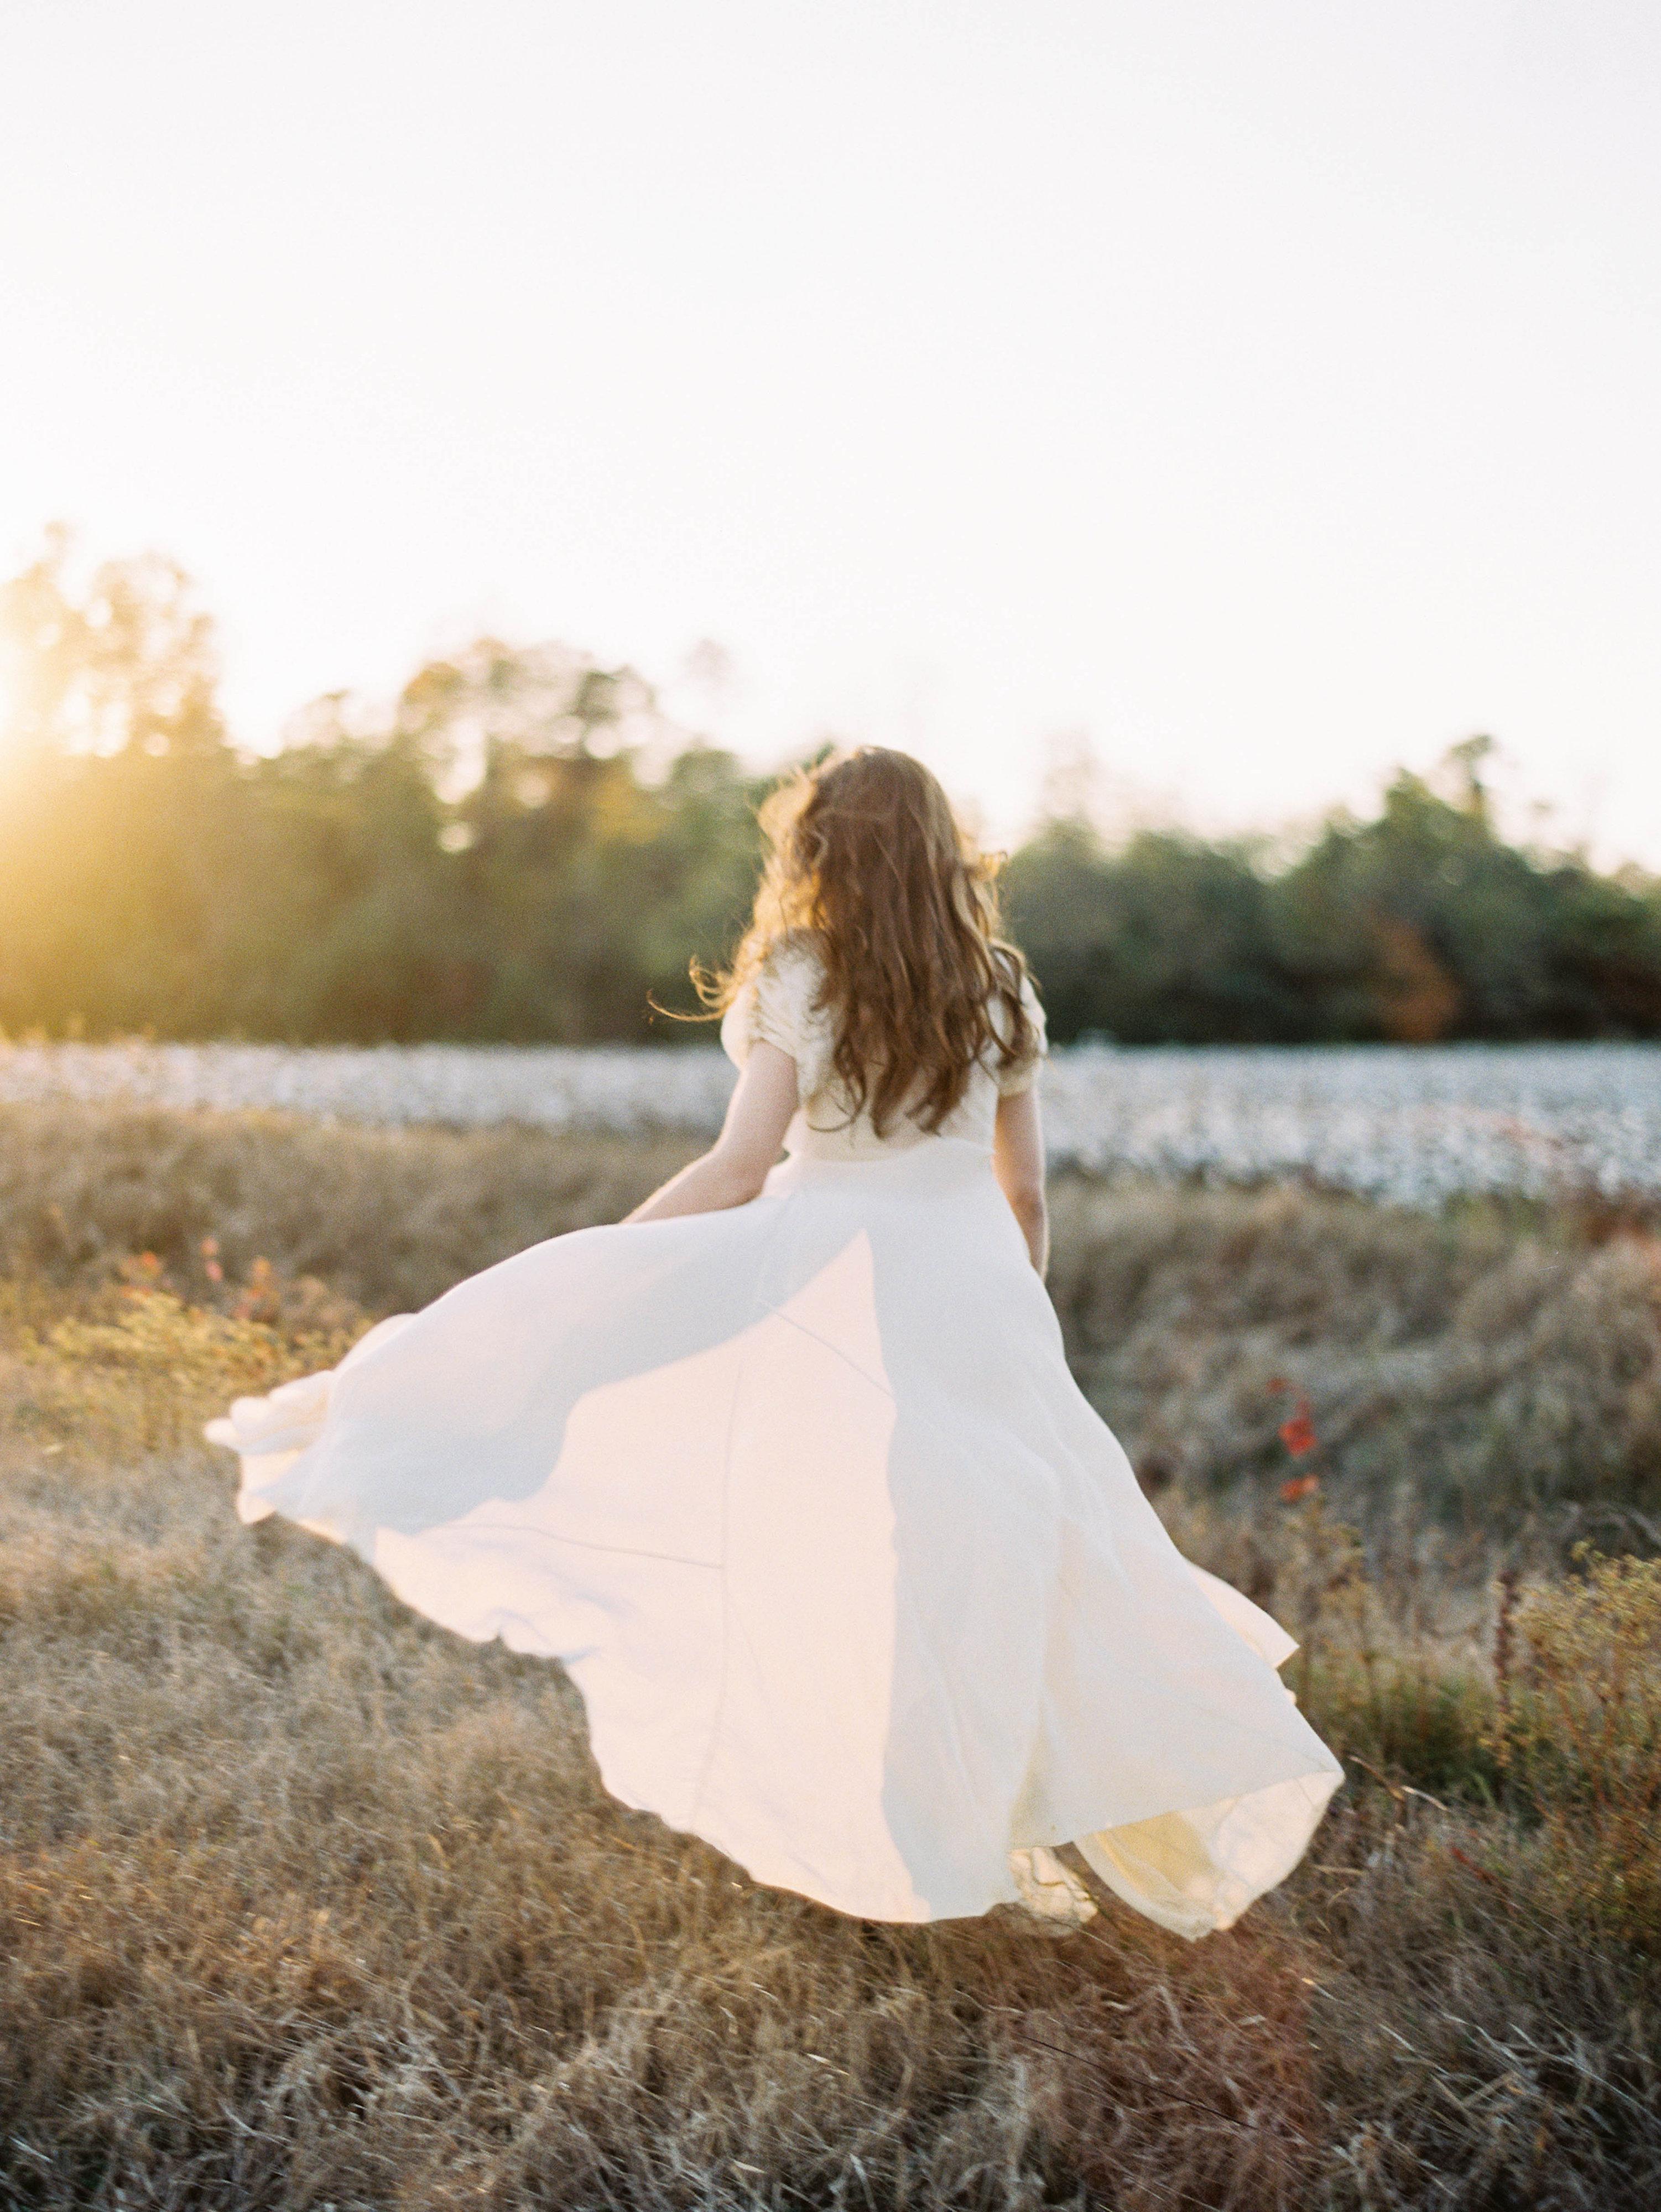 Shop Gossamer Gown - Elizabeth Anne Designs: The Wedding Blog